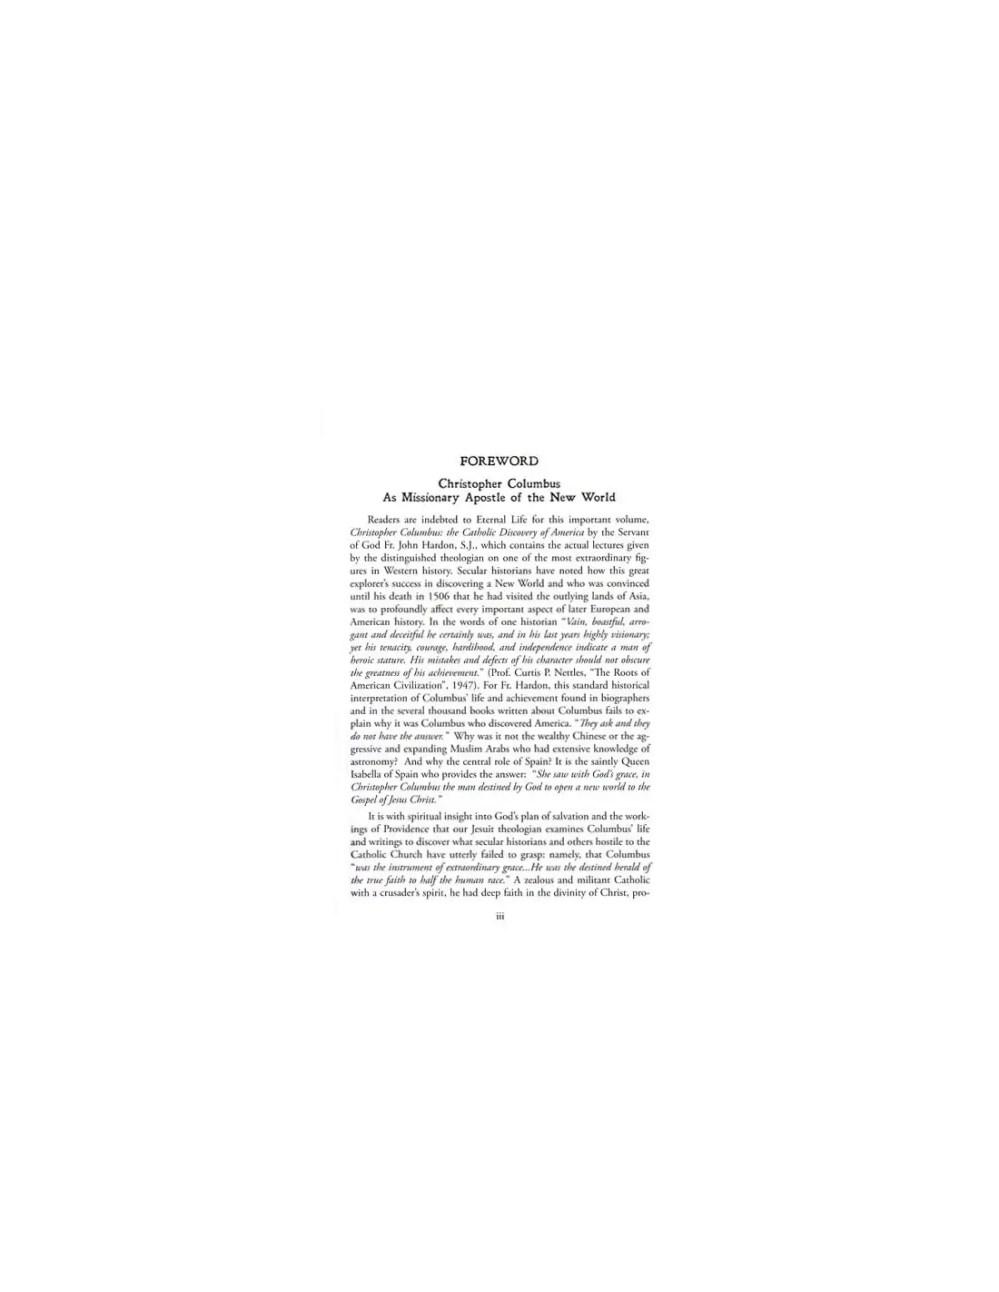 medium resolution of Christopher Columbus: The Catholic Discovery of America